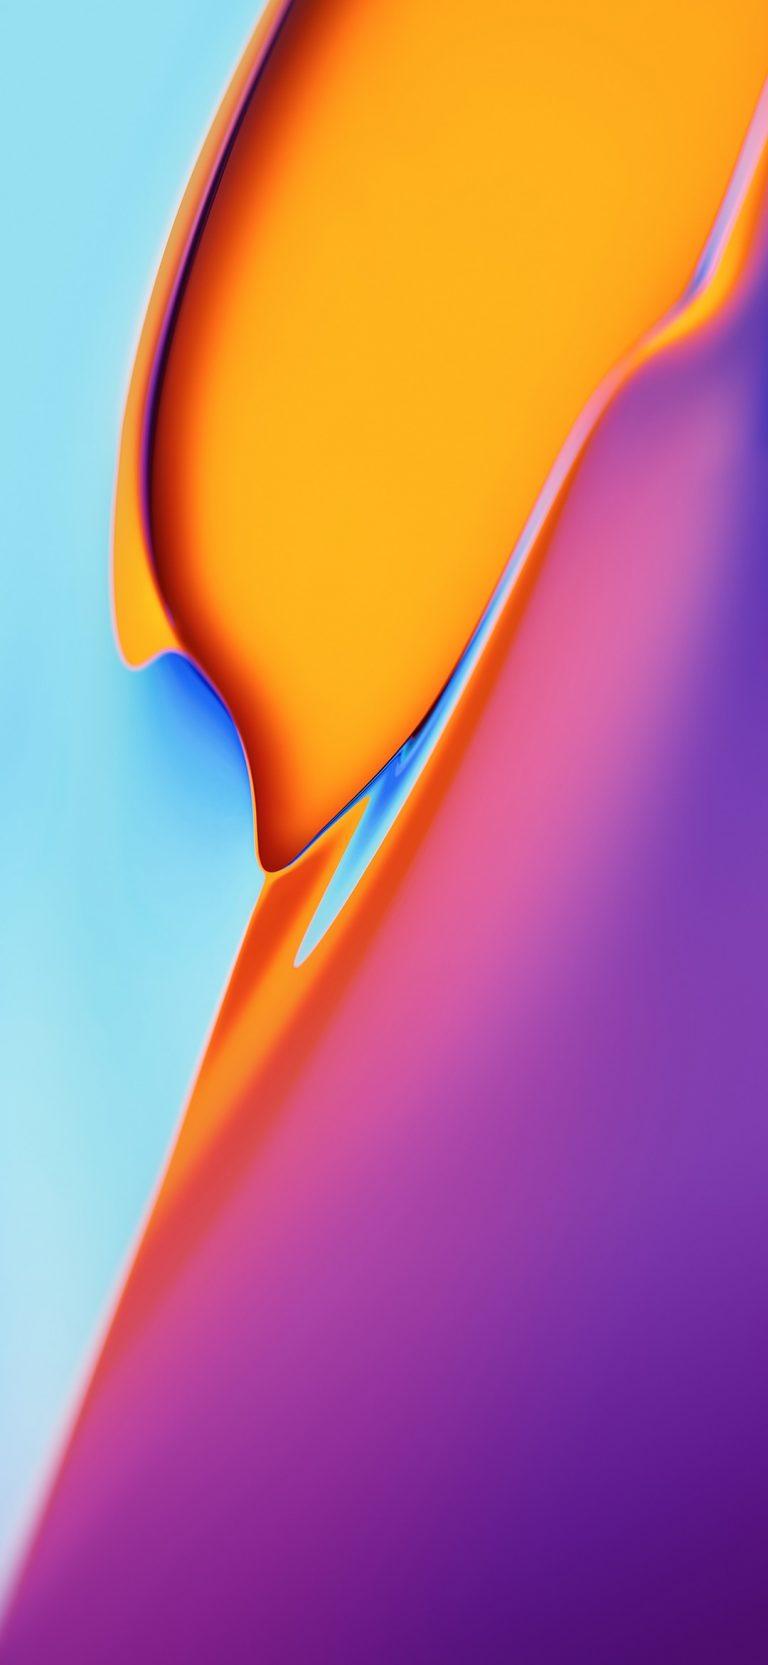 OnePlus TV Stock Wallpaper 03 1080x2342 768x1665